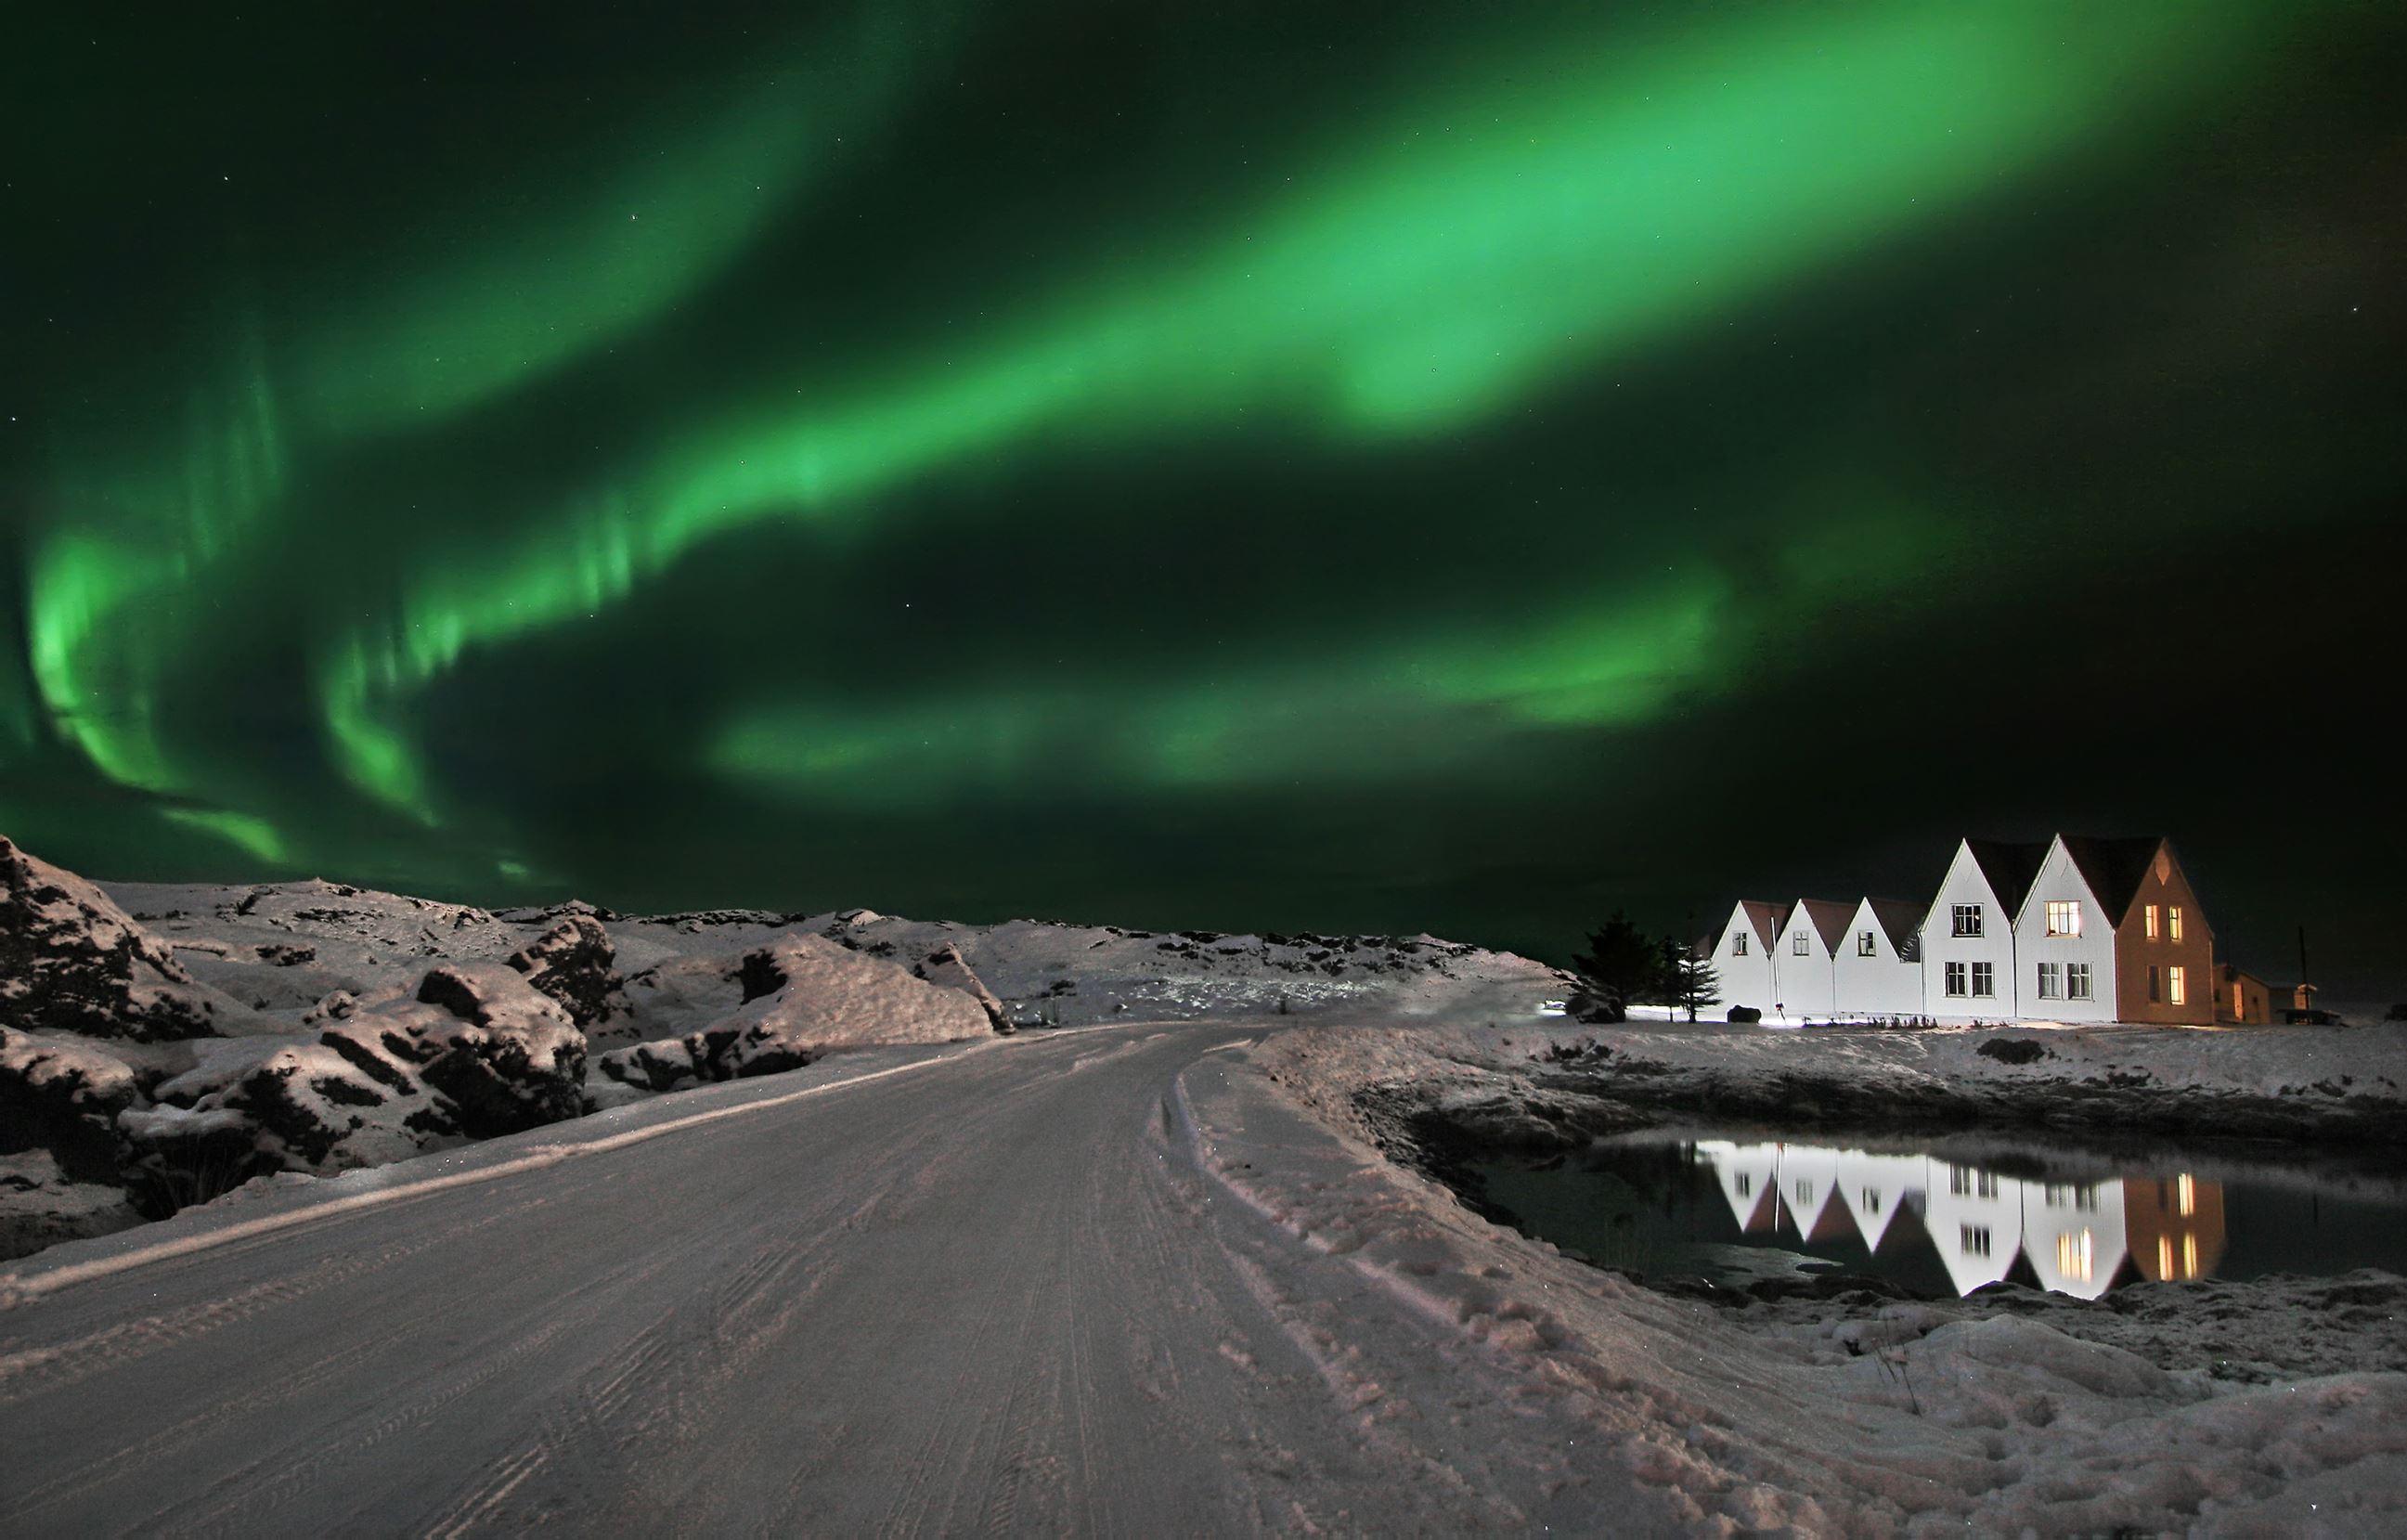 iceland february exclusive straumur aurora hafnarfjr ur iceland